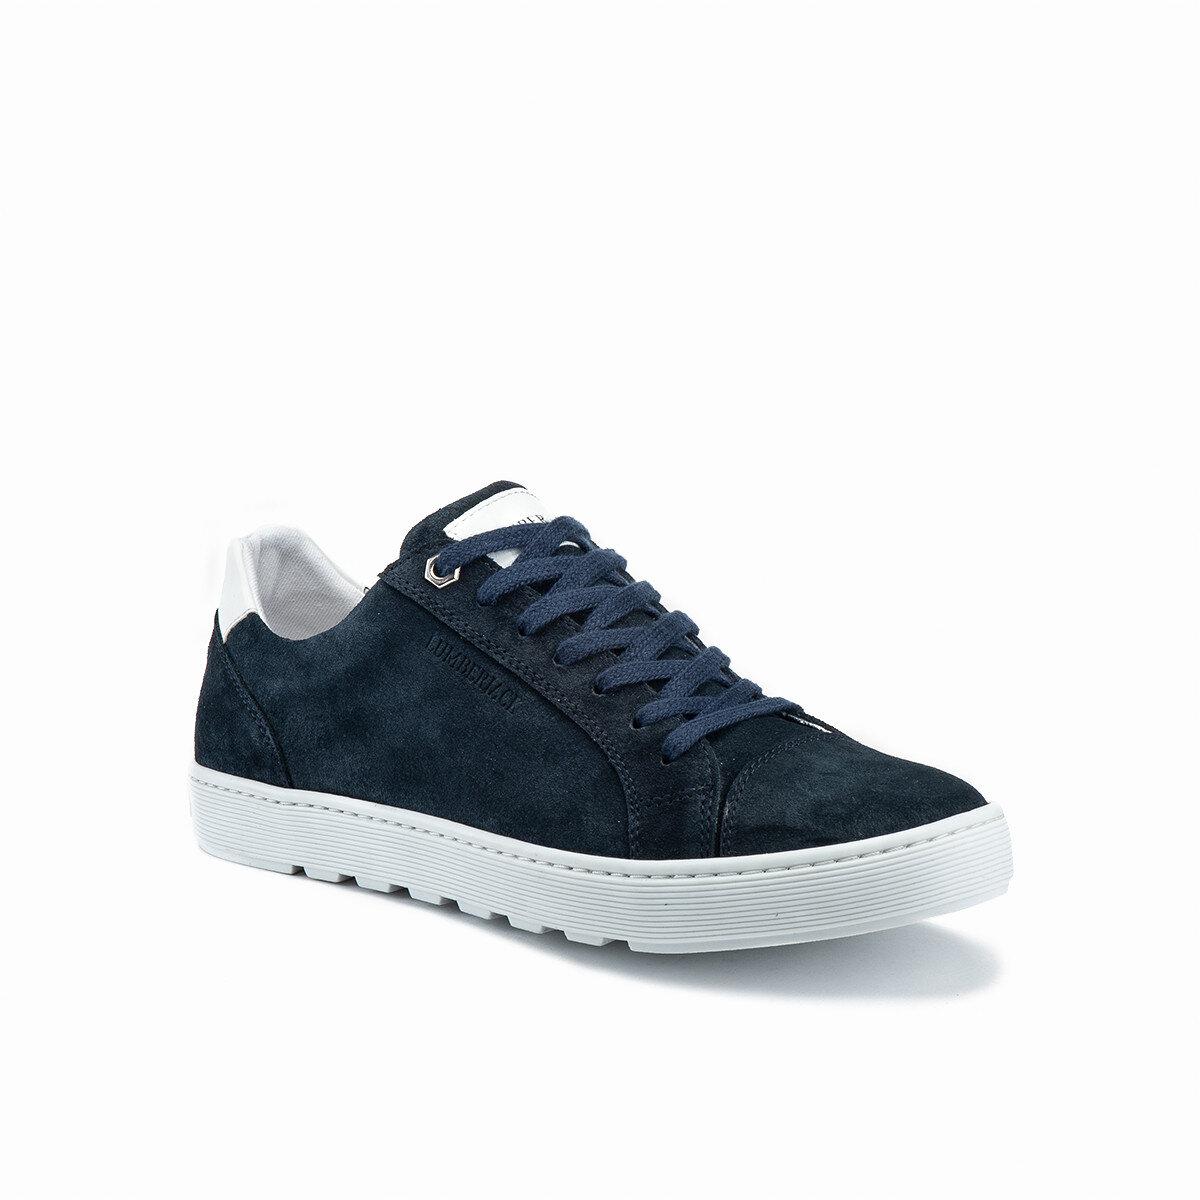 WAYNE Sneakers Uomo